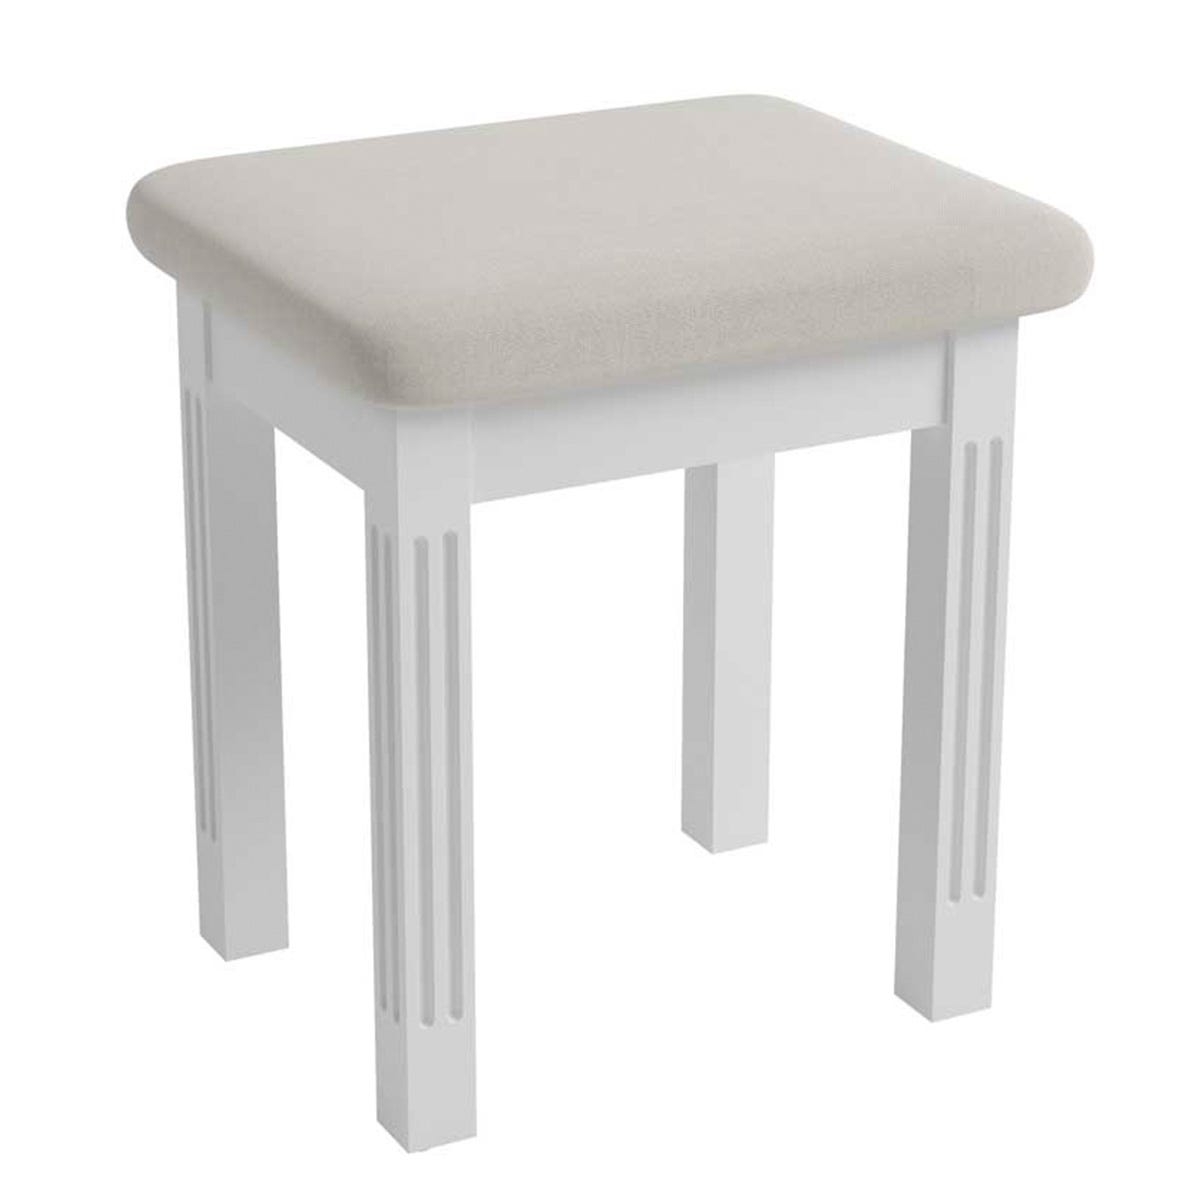 Bingley Dressing Table Stool - White